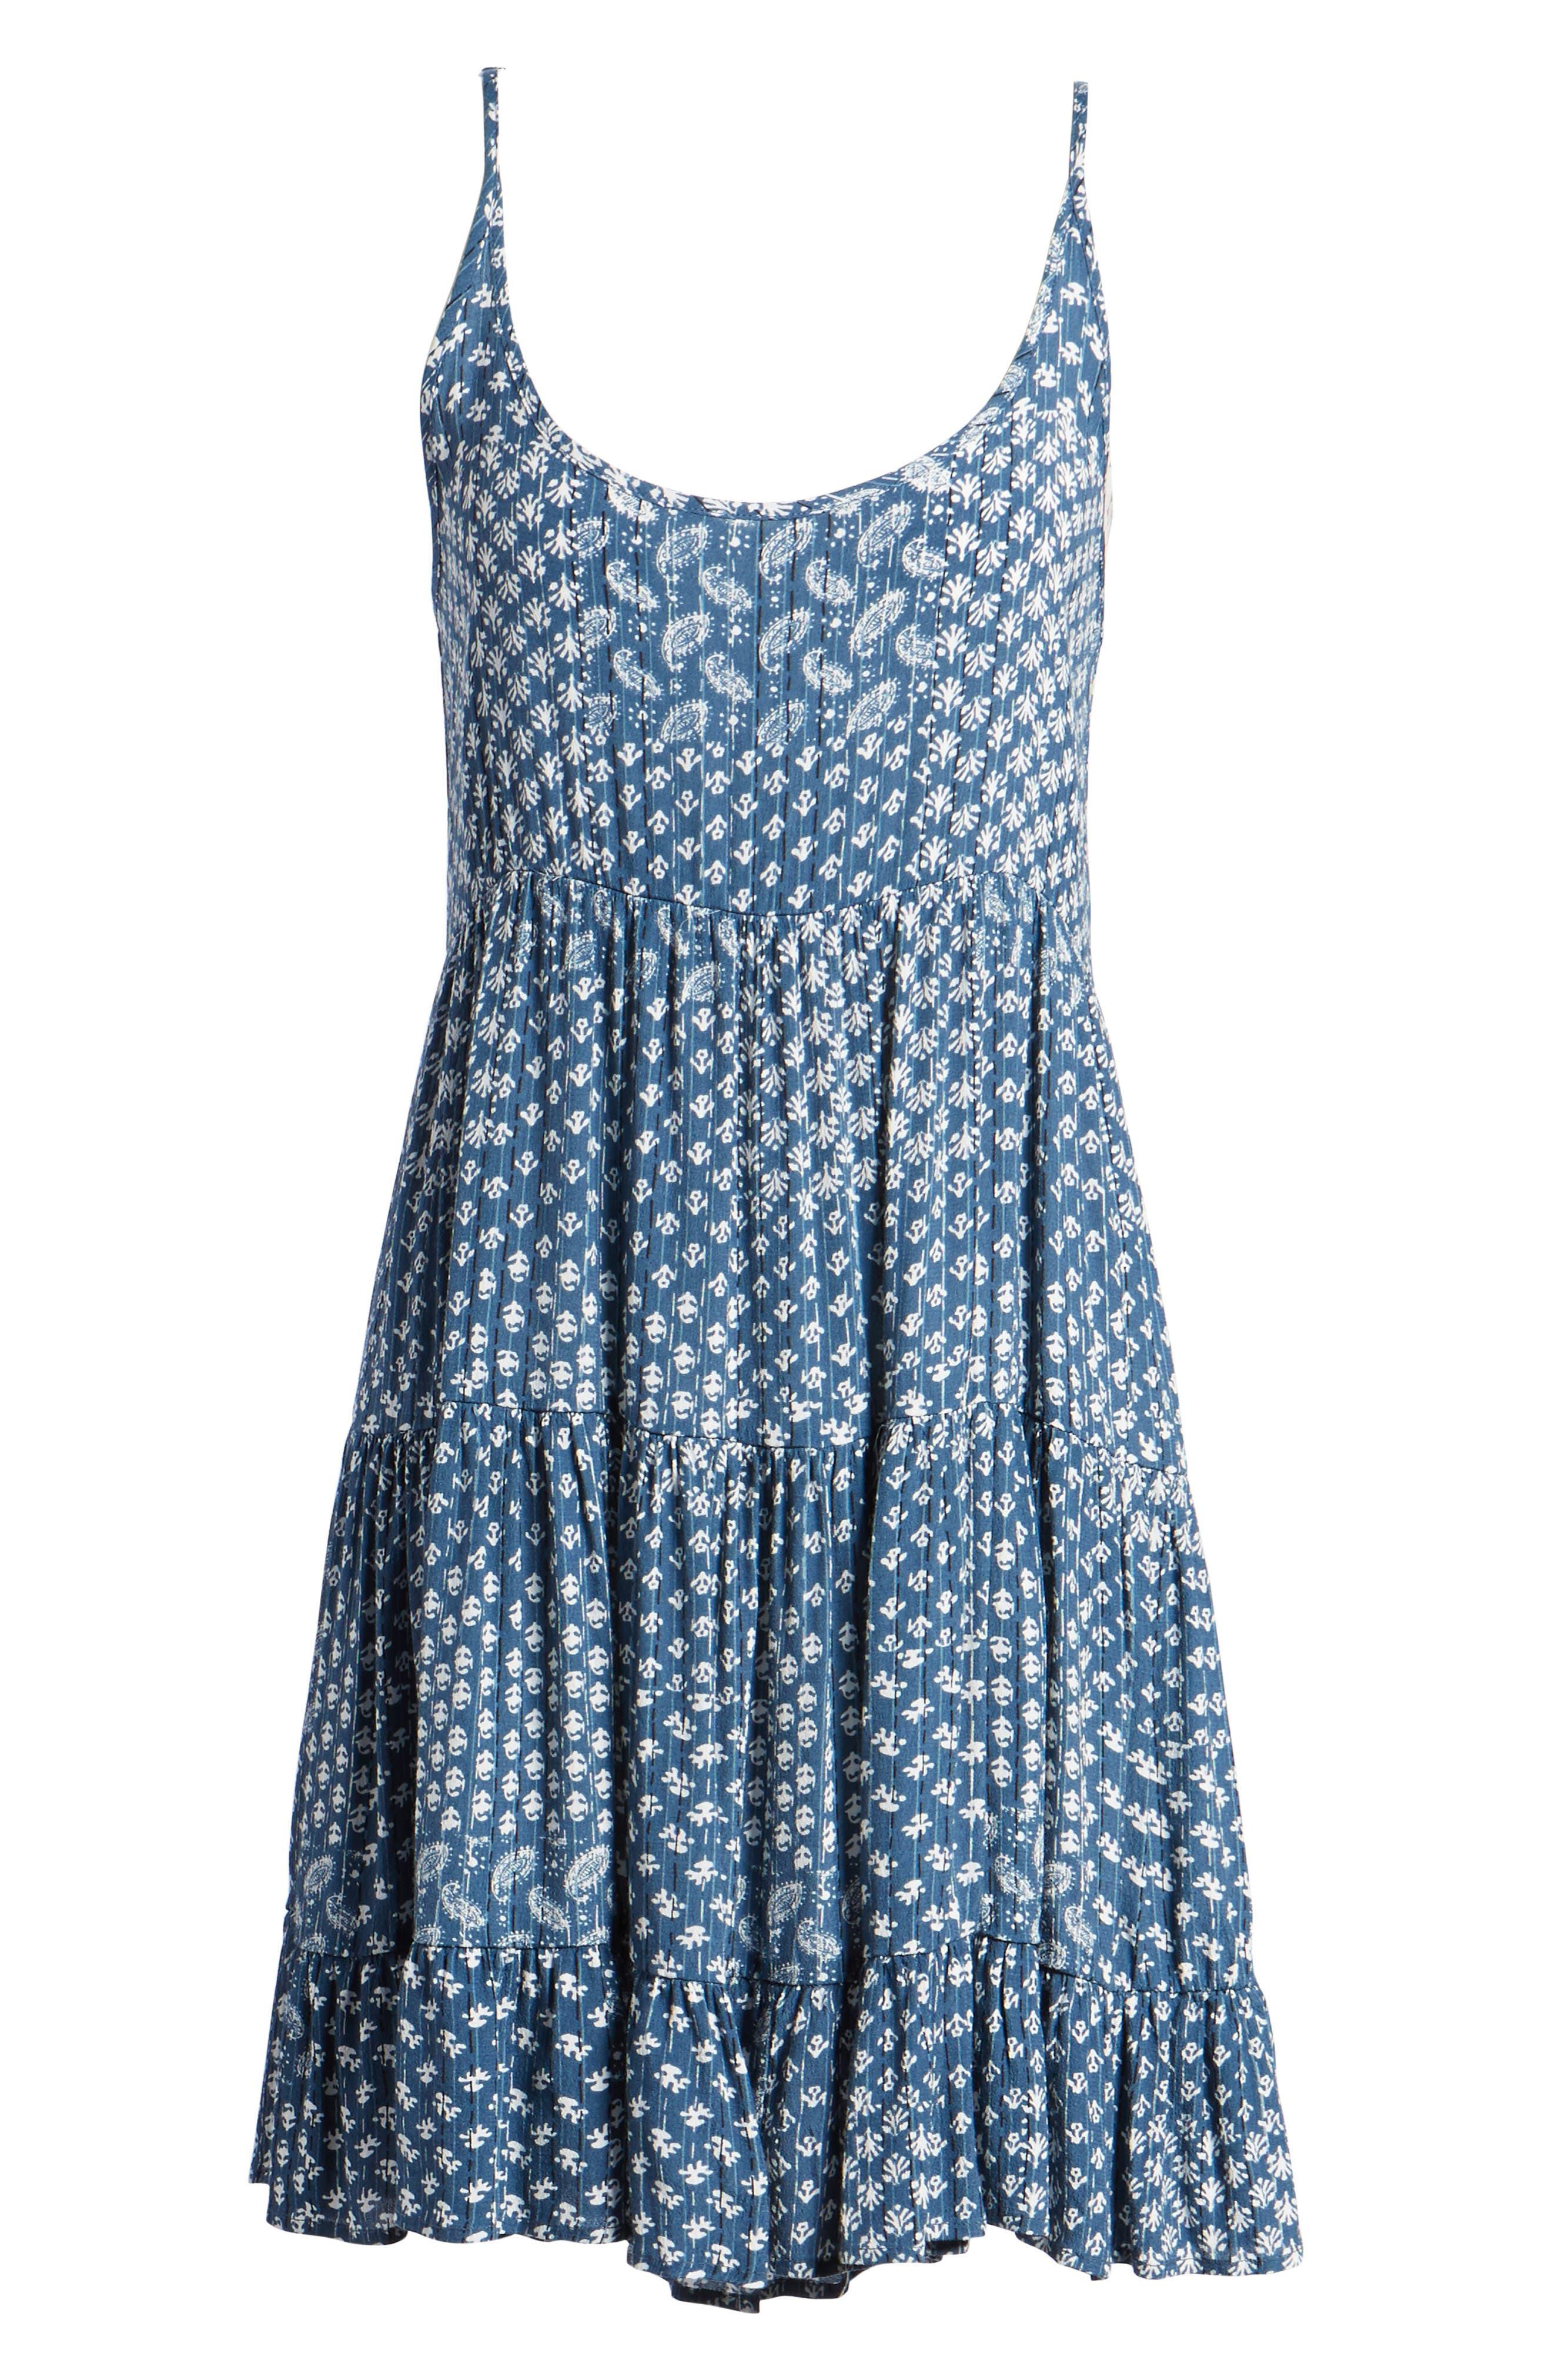 Amber Swing Dress,                             Alternate thumbnail 6, color,                             Indigo Patchwork